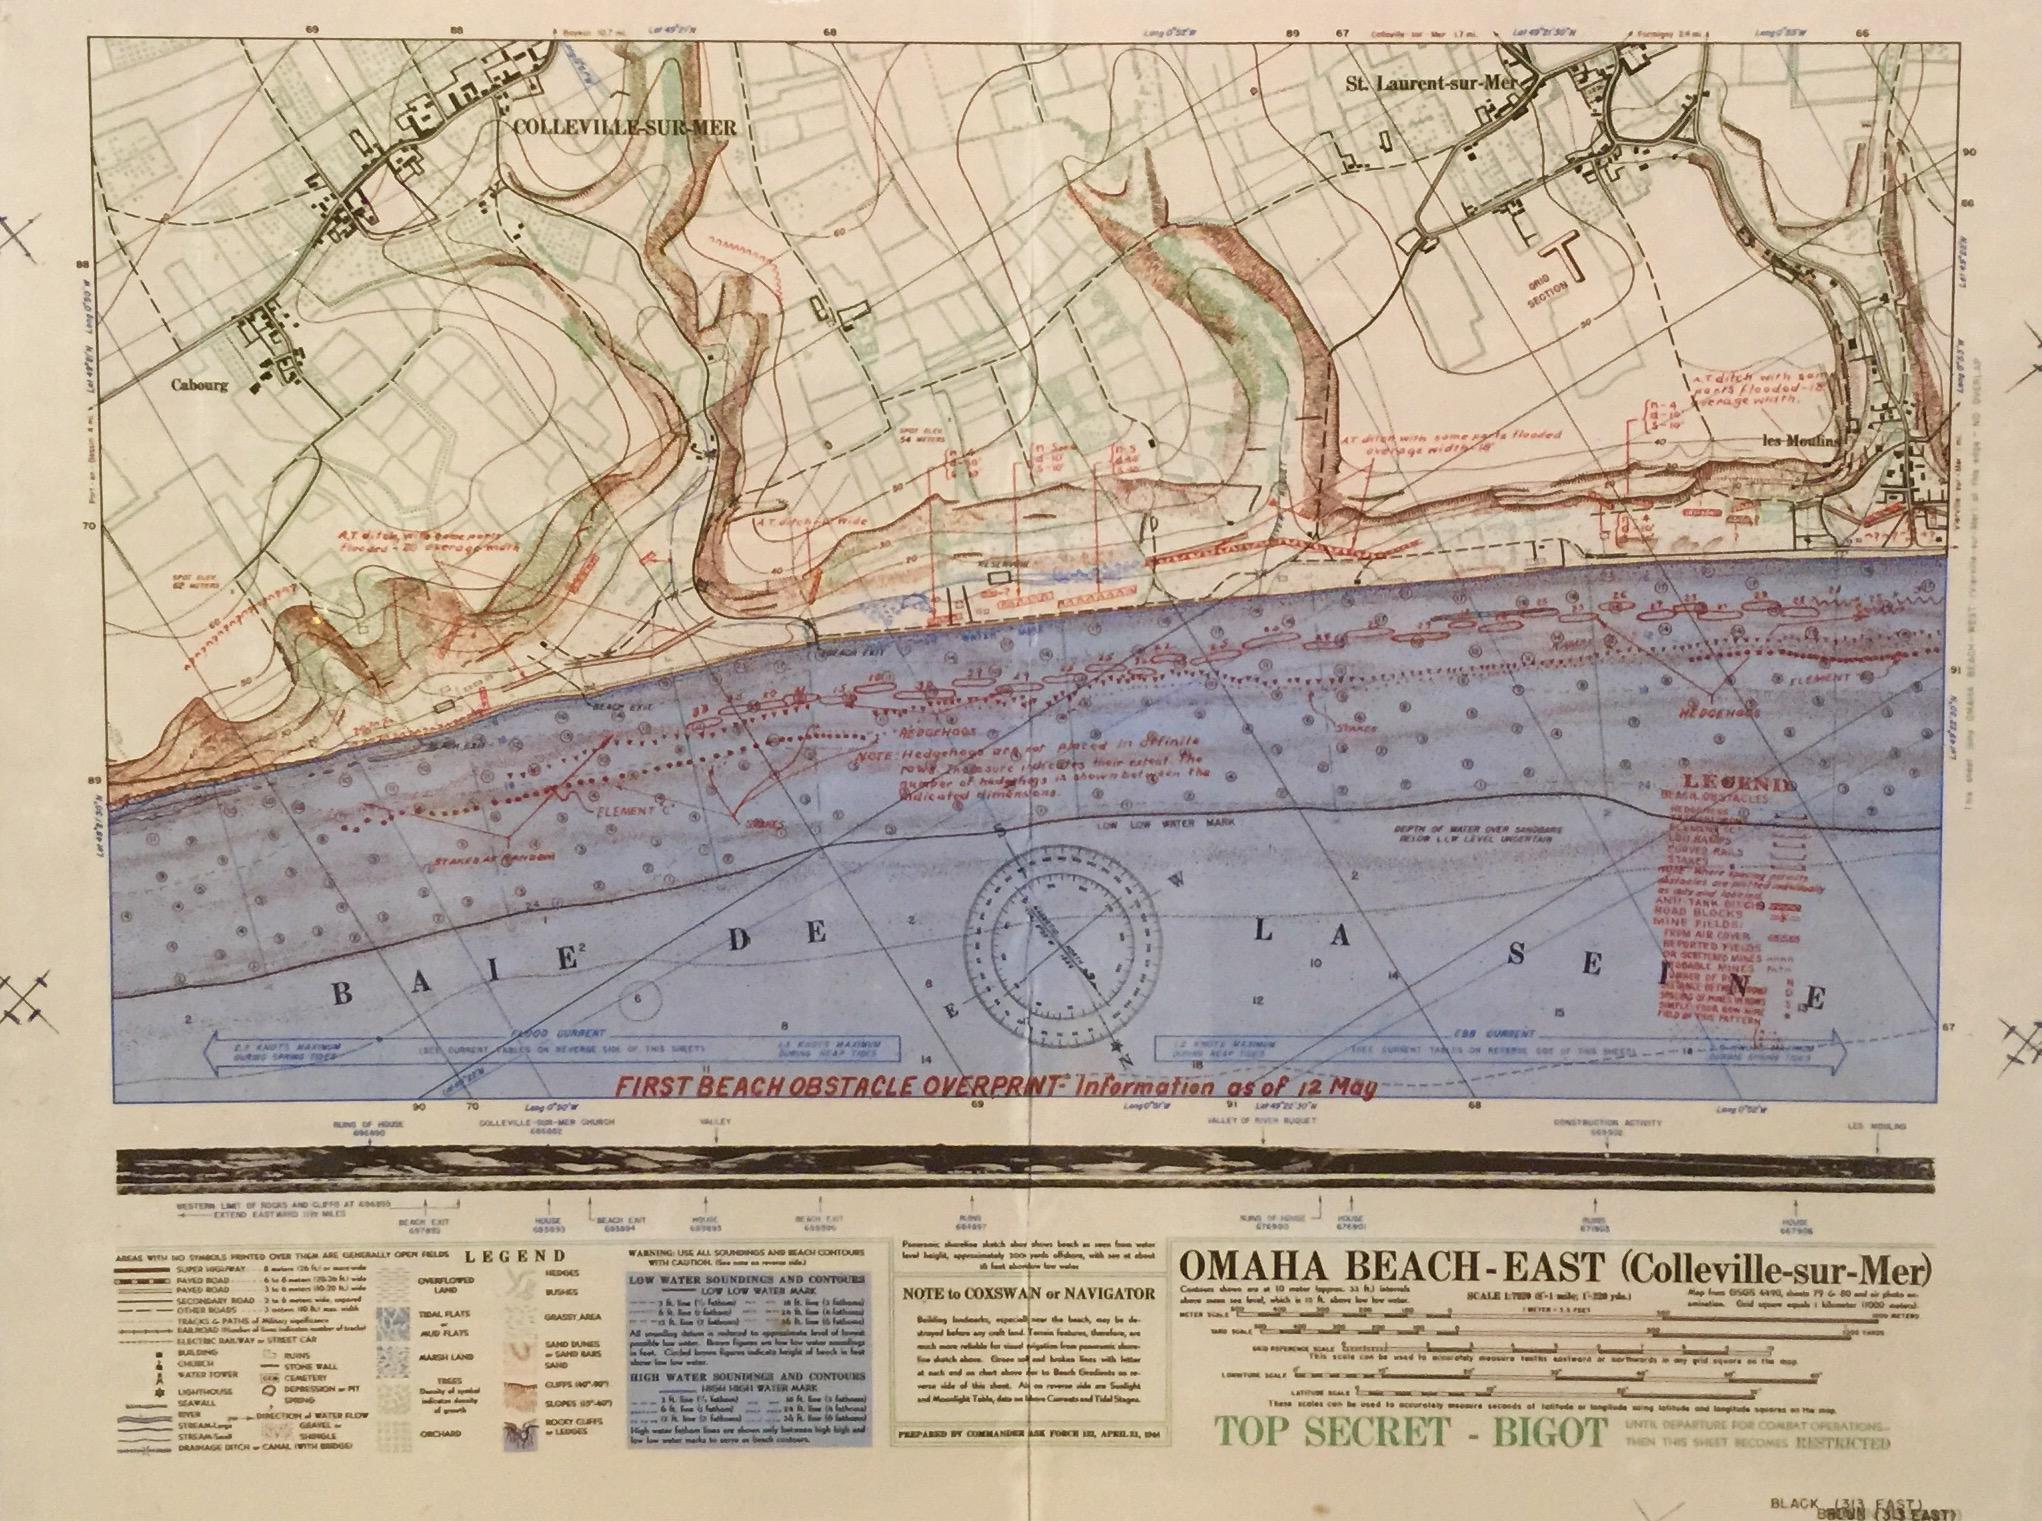 Omaha Beach - East invasion map